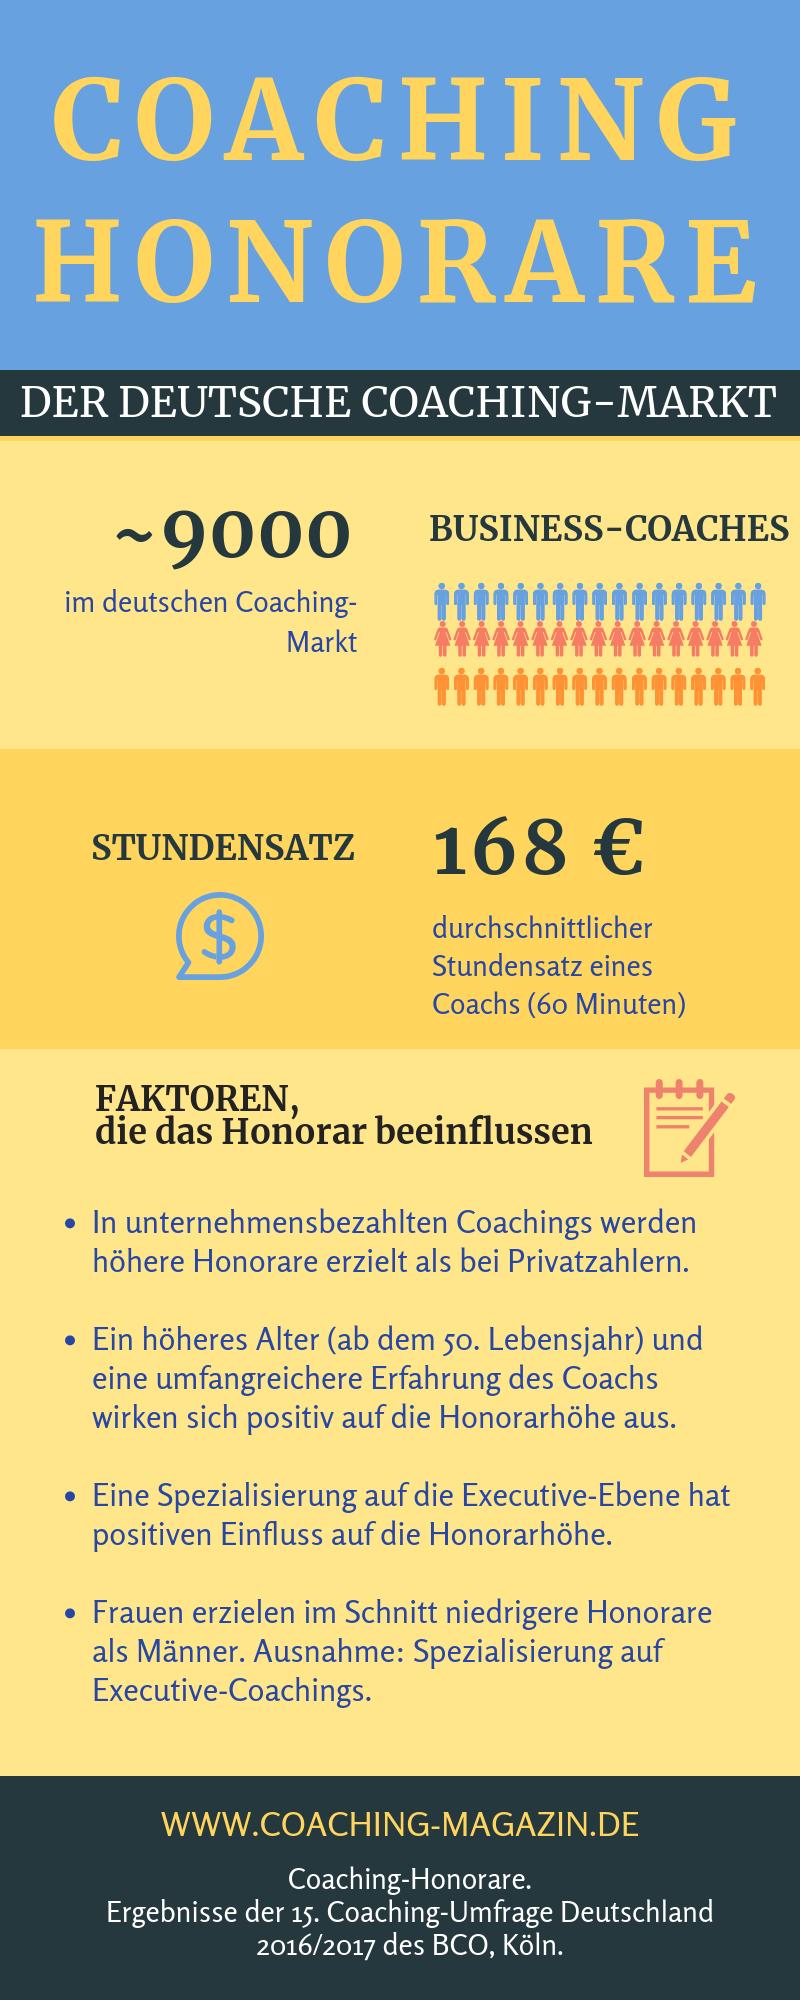 Coaching Honorare Coaching Lebenslauf Tipps Umfragen Geld Verdienen